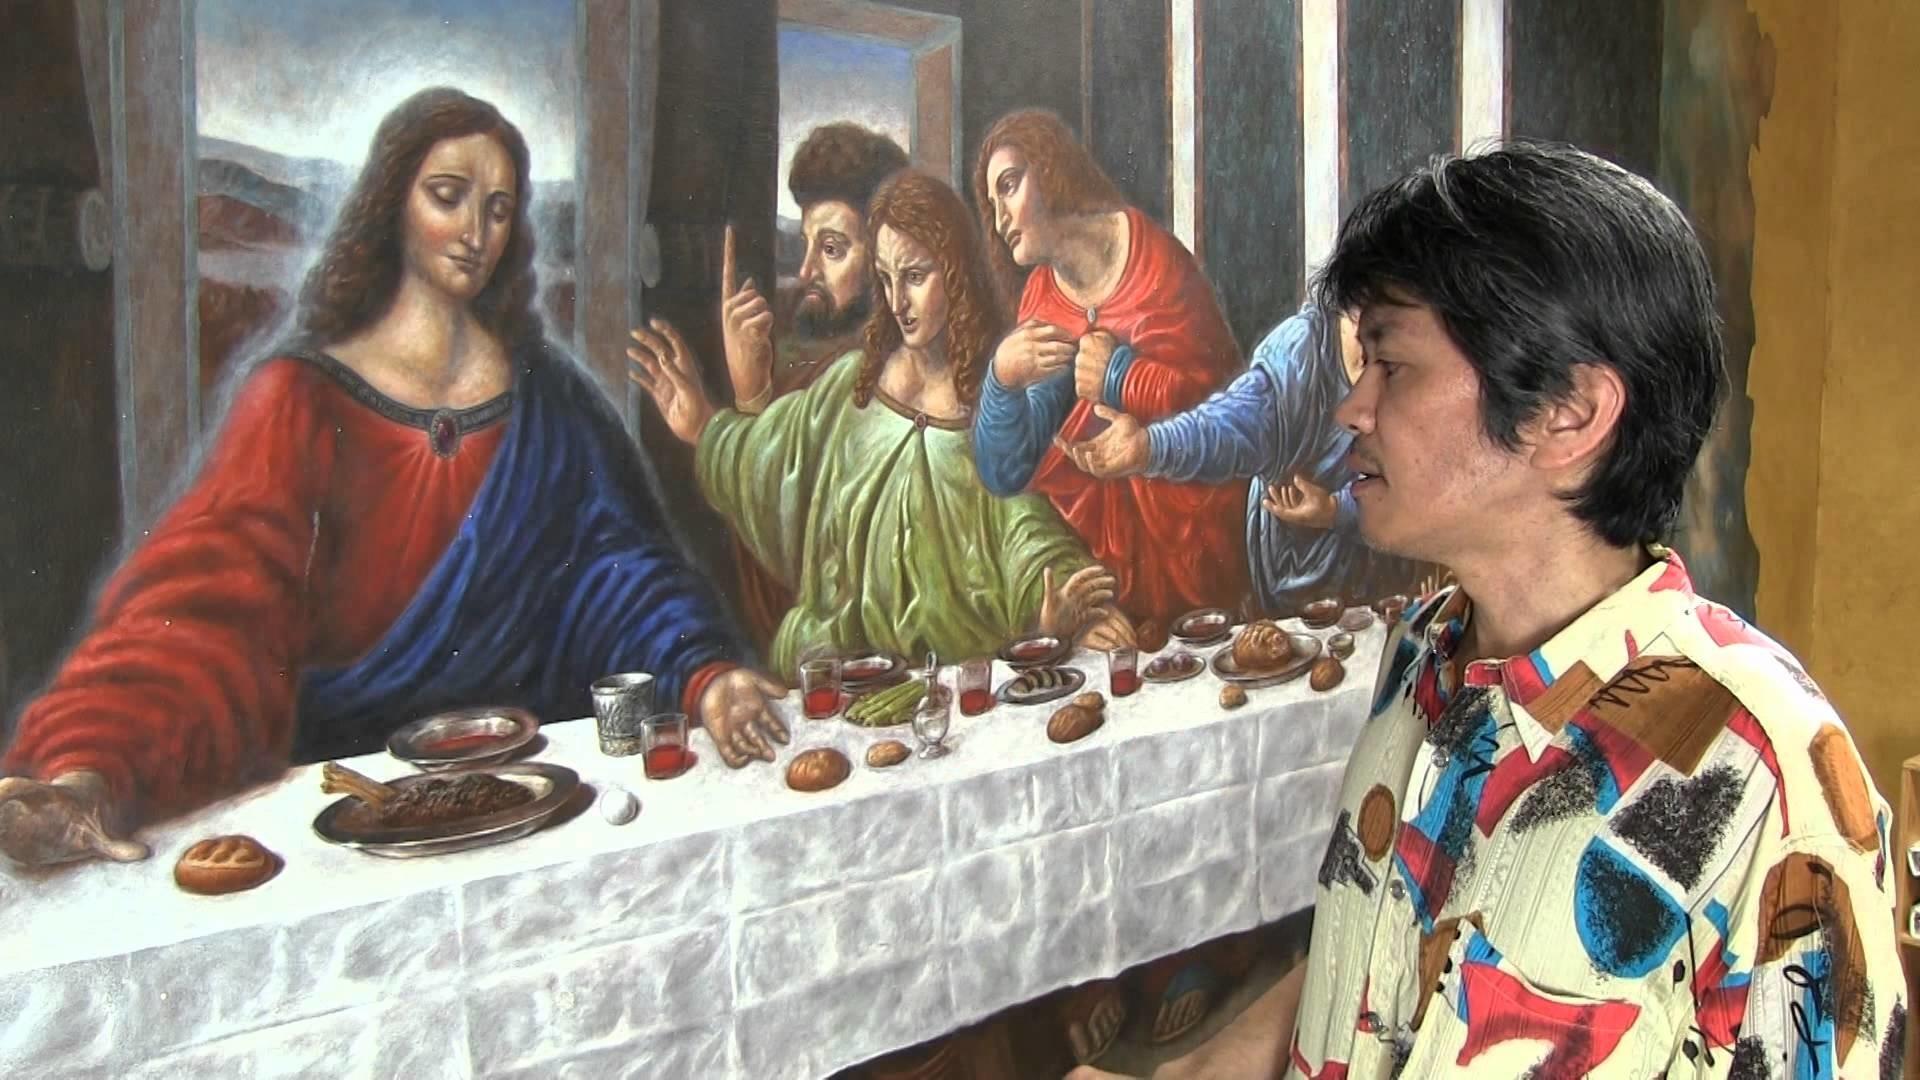 Hikaru has re-created The Last Supper by Leonardo da Vinci.